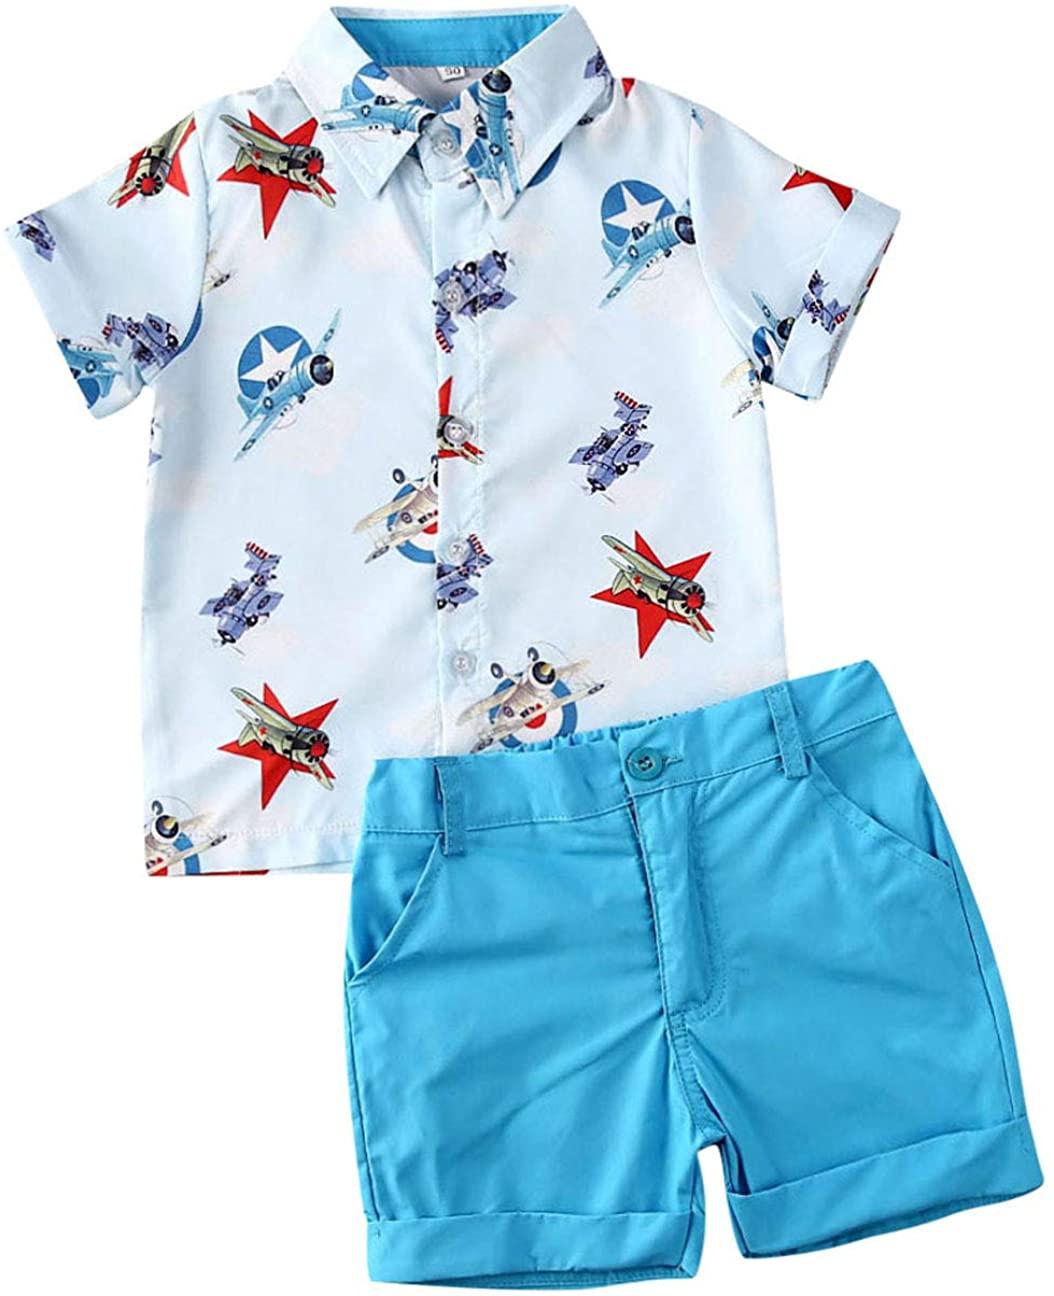 Toddler Baby Boys Print2Pcs Summer Outfits Short Sleeve Button Down Shirt & Casual Shorts Set